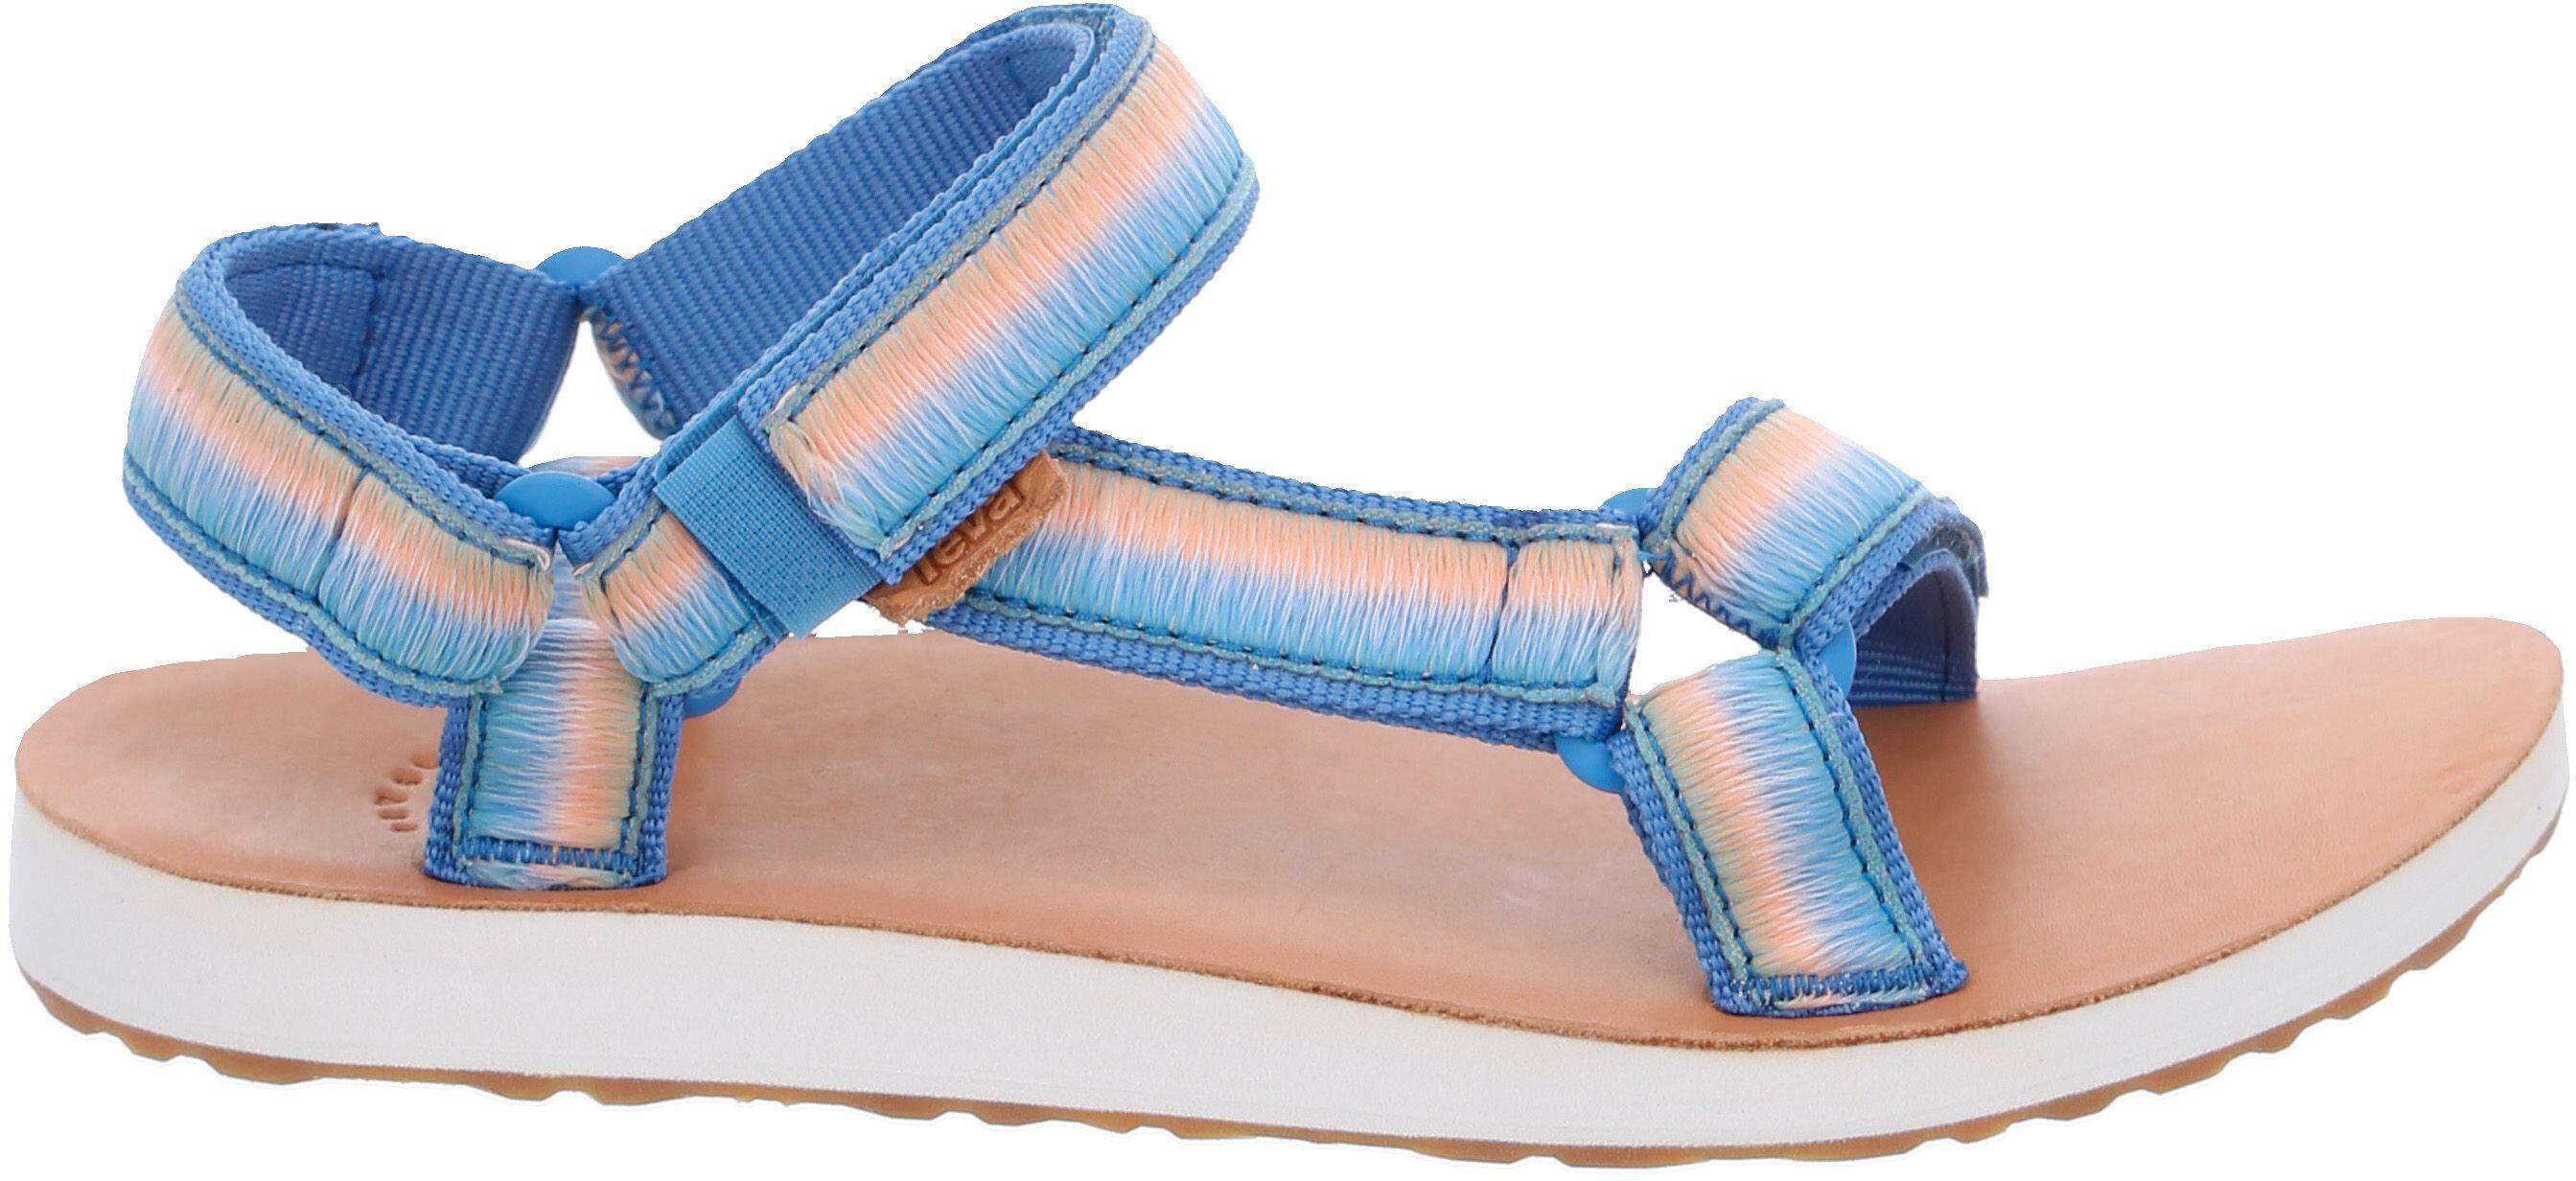 Teva Original Universal Ombre Sandals Women ceramic blue   campz.ch dc69ee4068